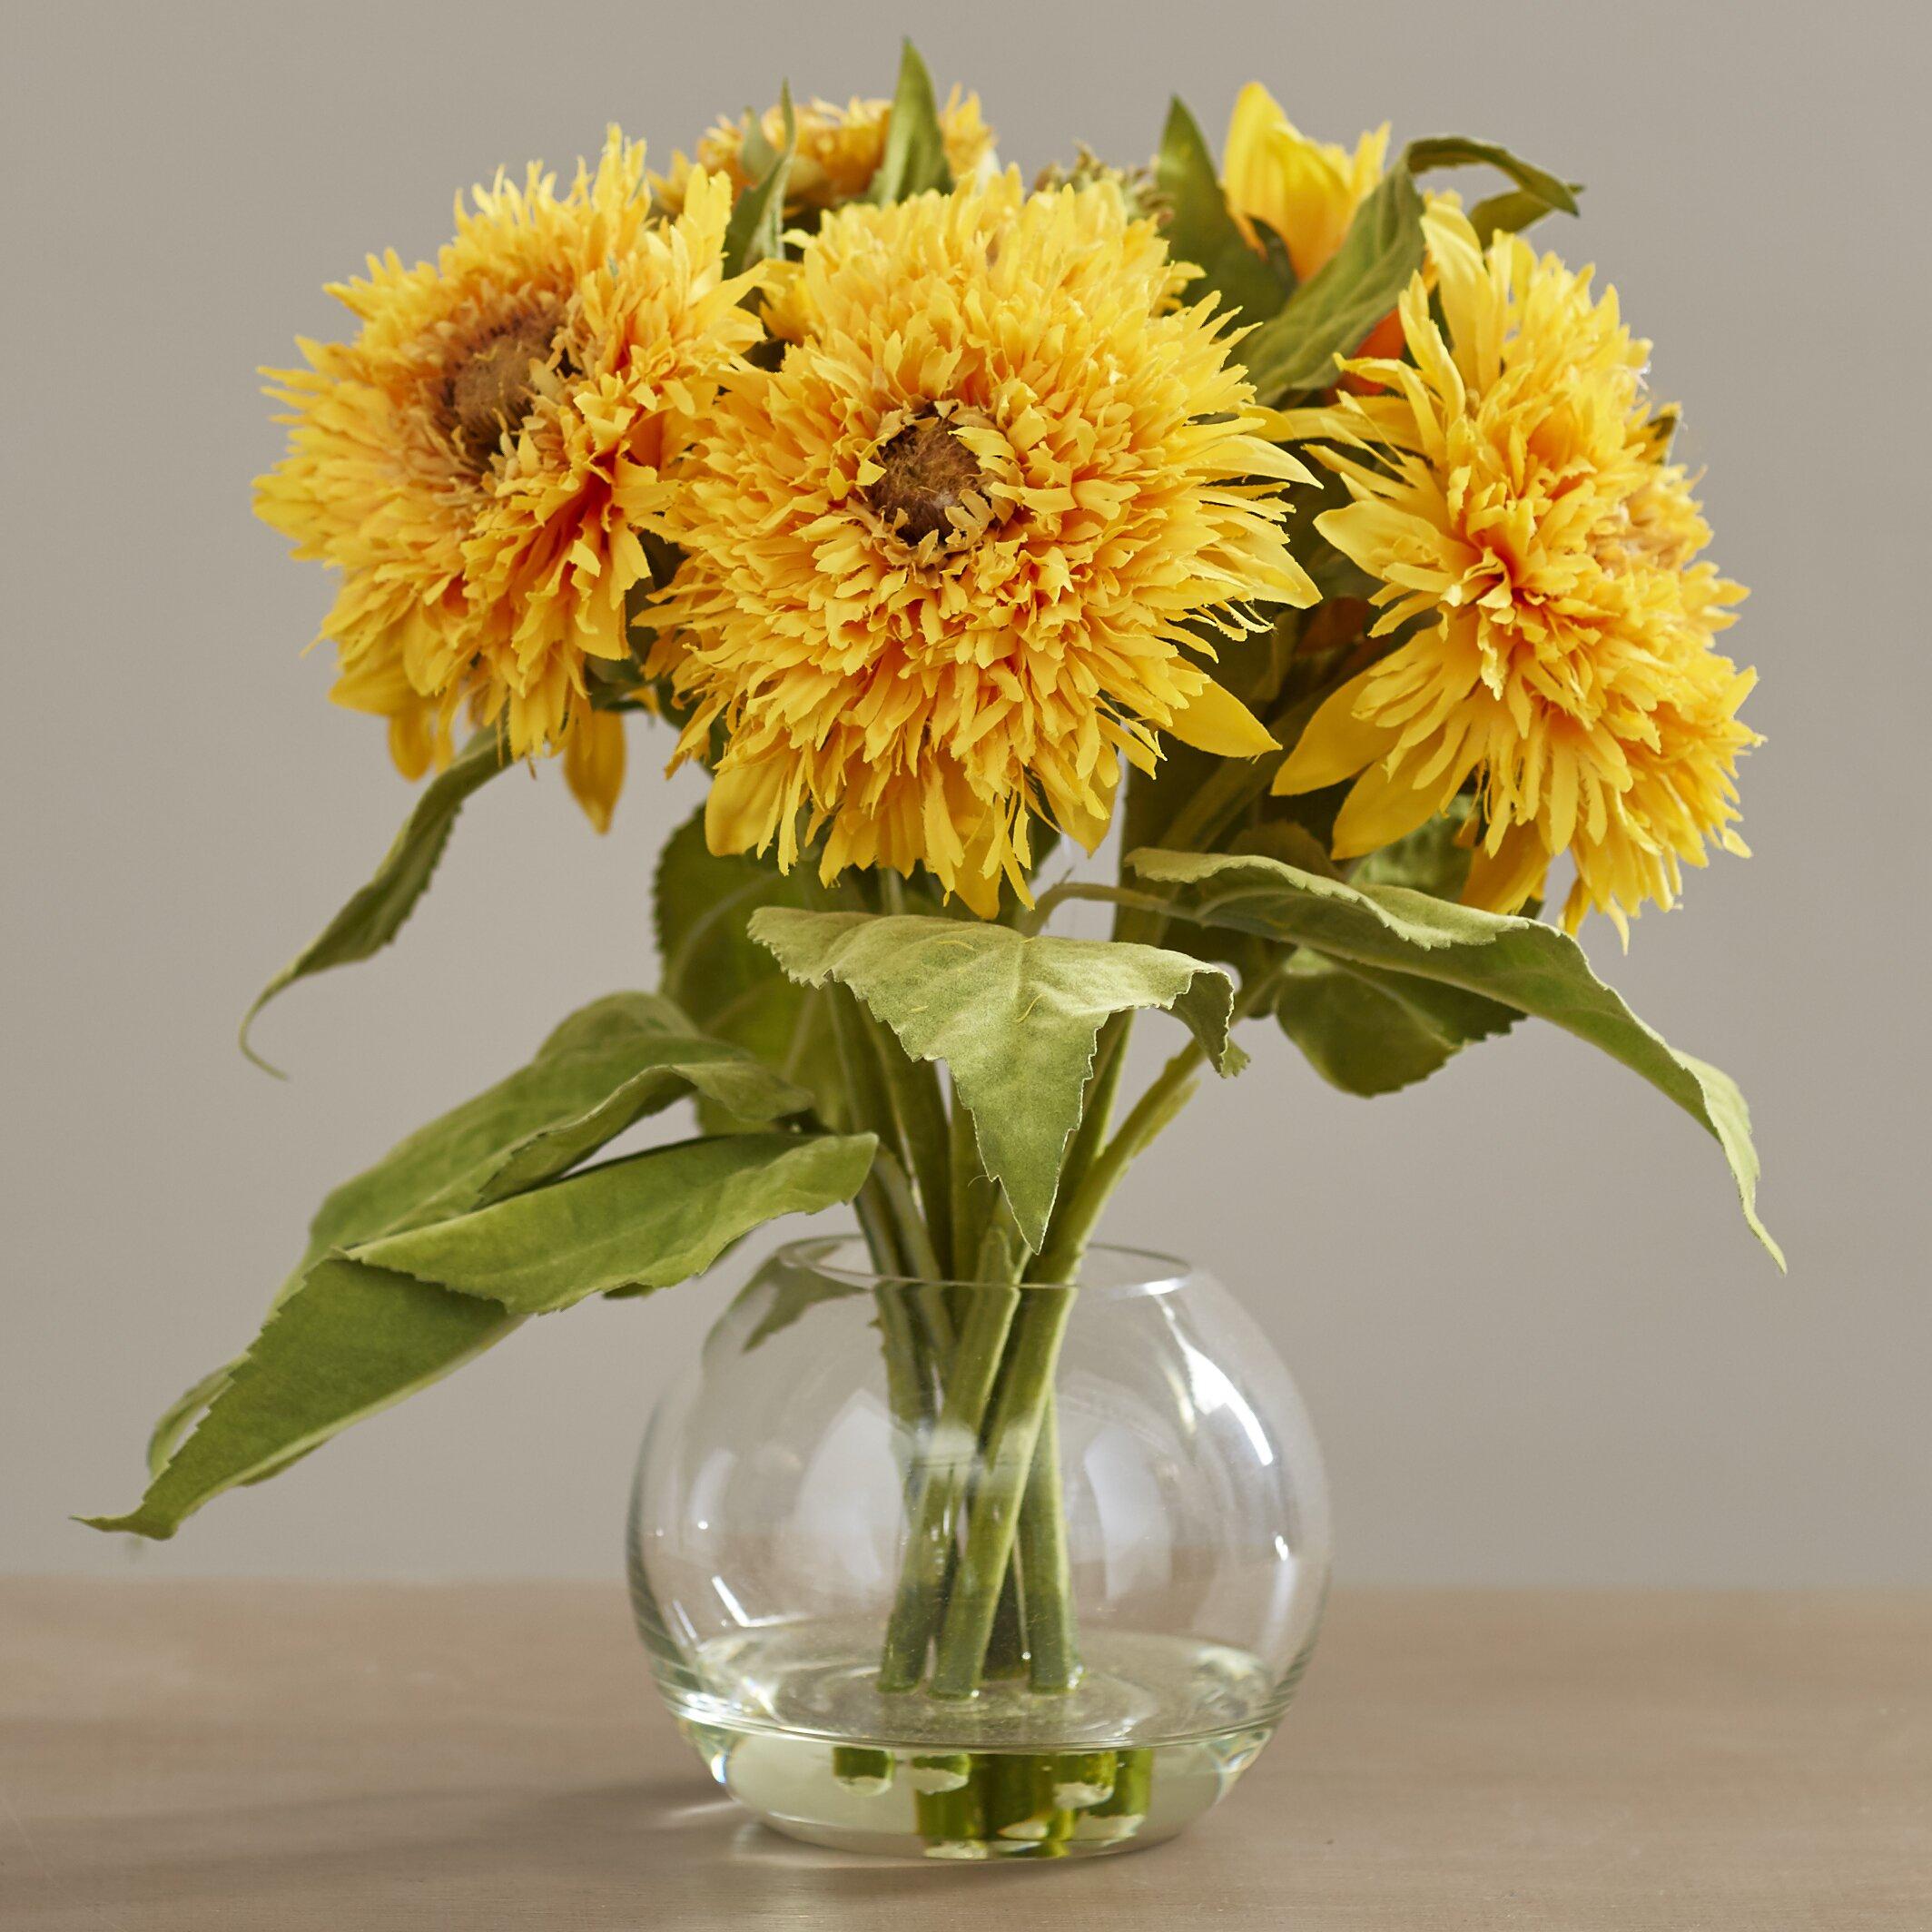 August grove golden sunflower arrangement in vase